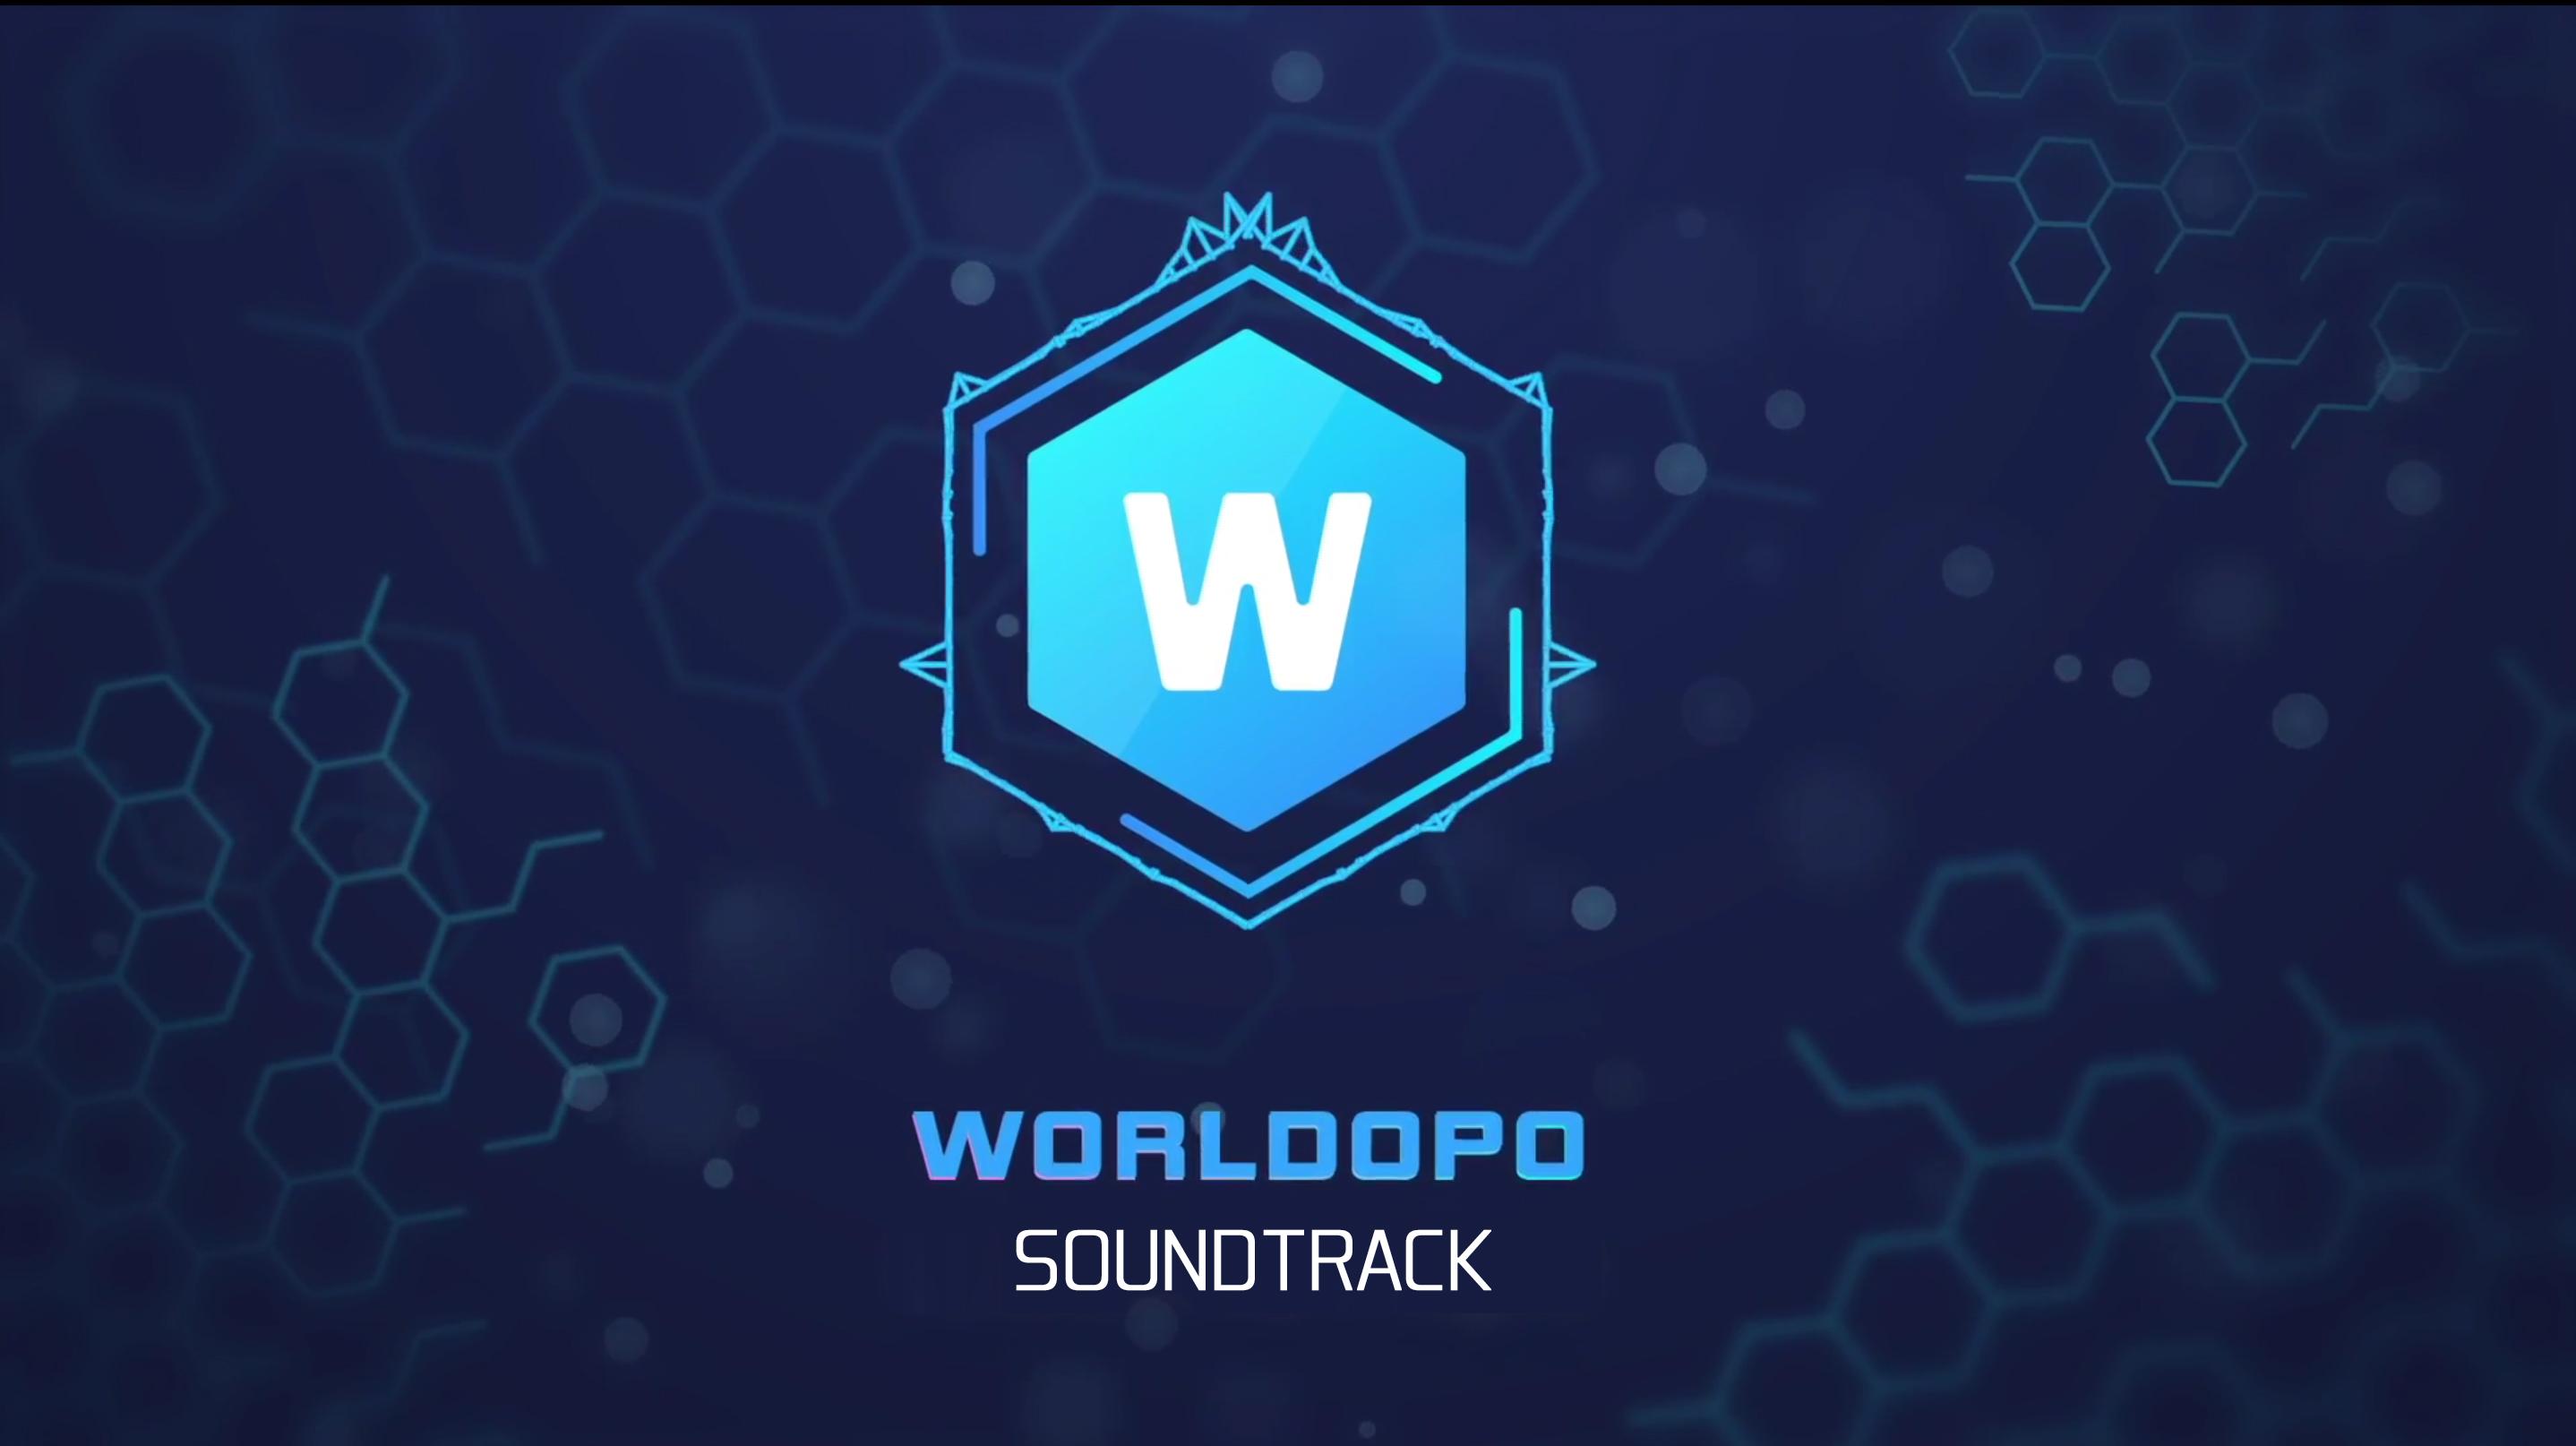 Worldopo Music & SFX